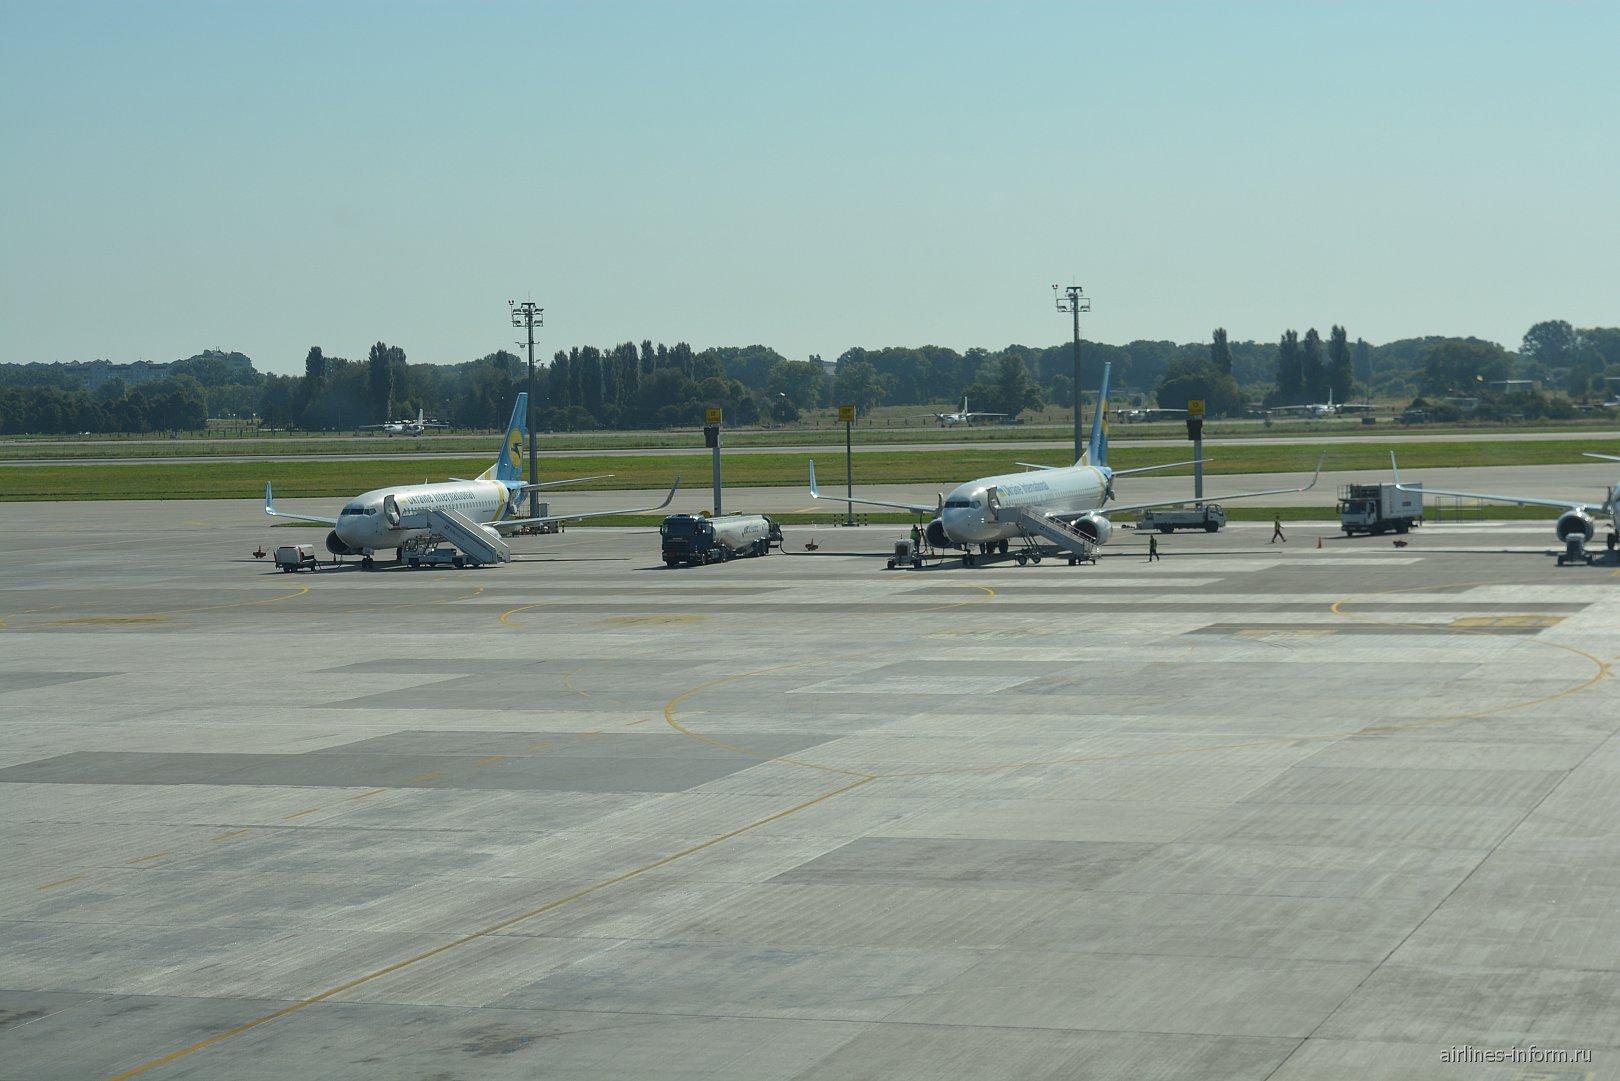 Перрон аэропорта Киев Борисполь